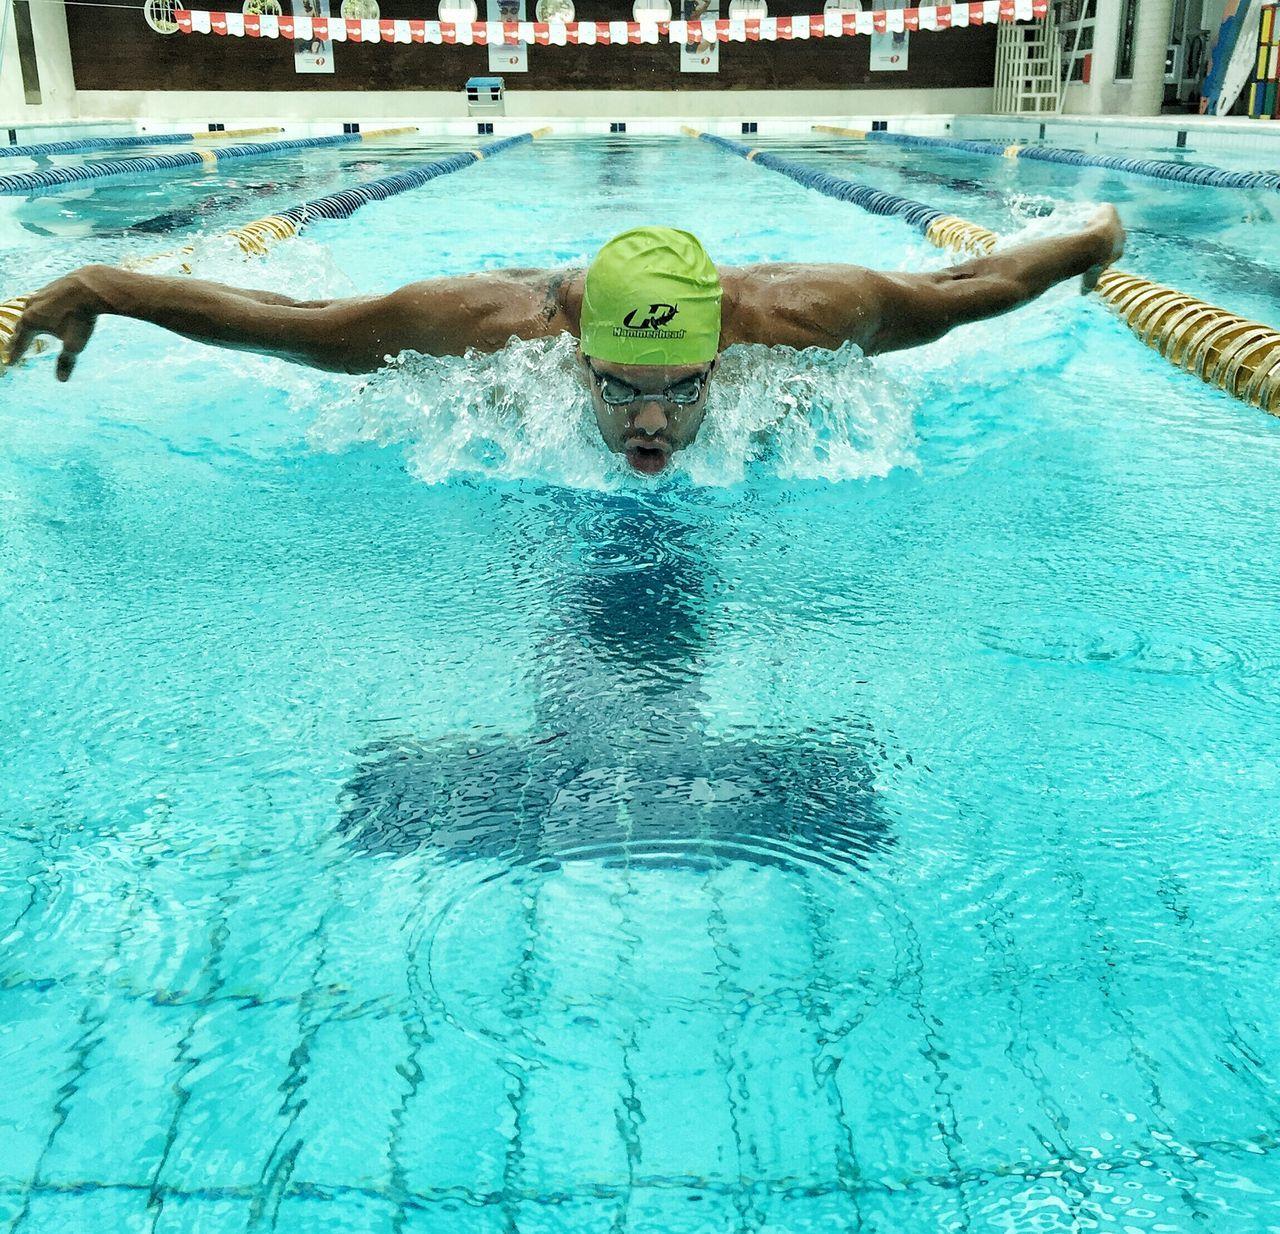 Superação2016 Esporte Paralimpico Paralimpics Paralimpic Games